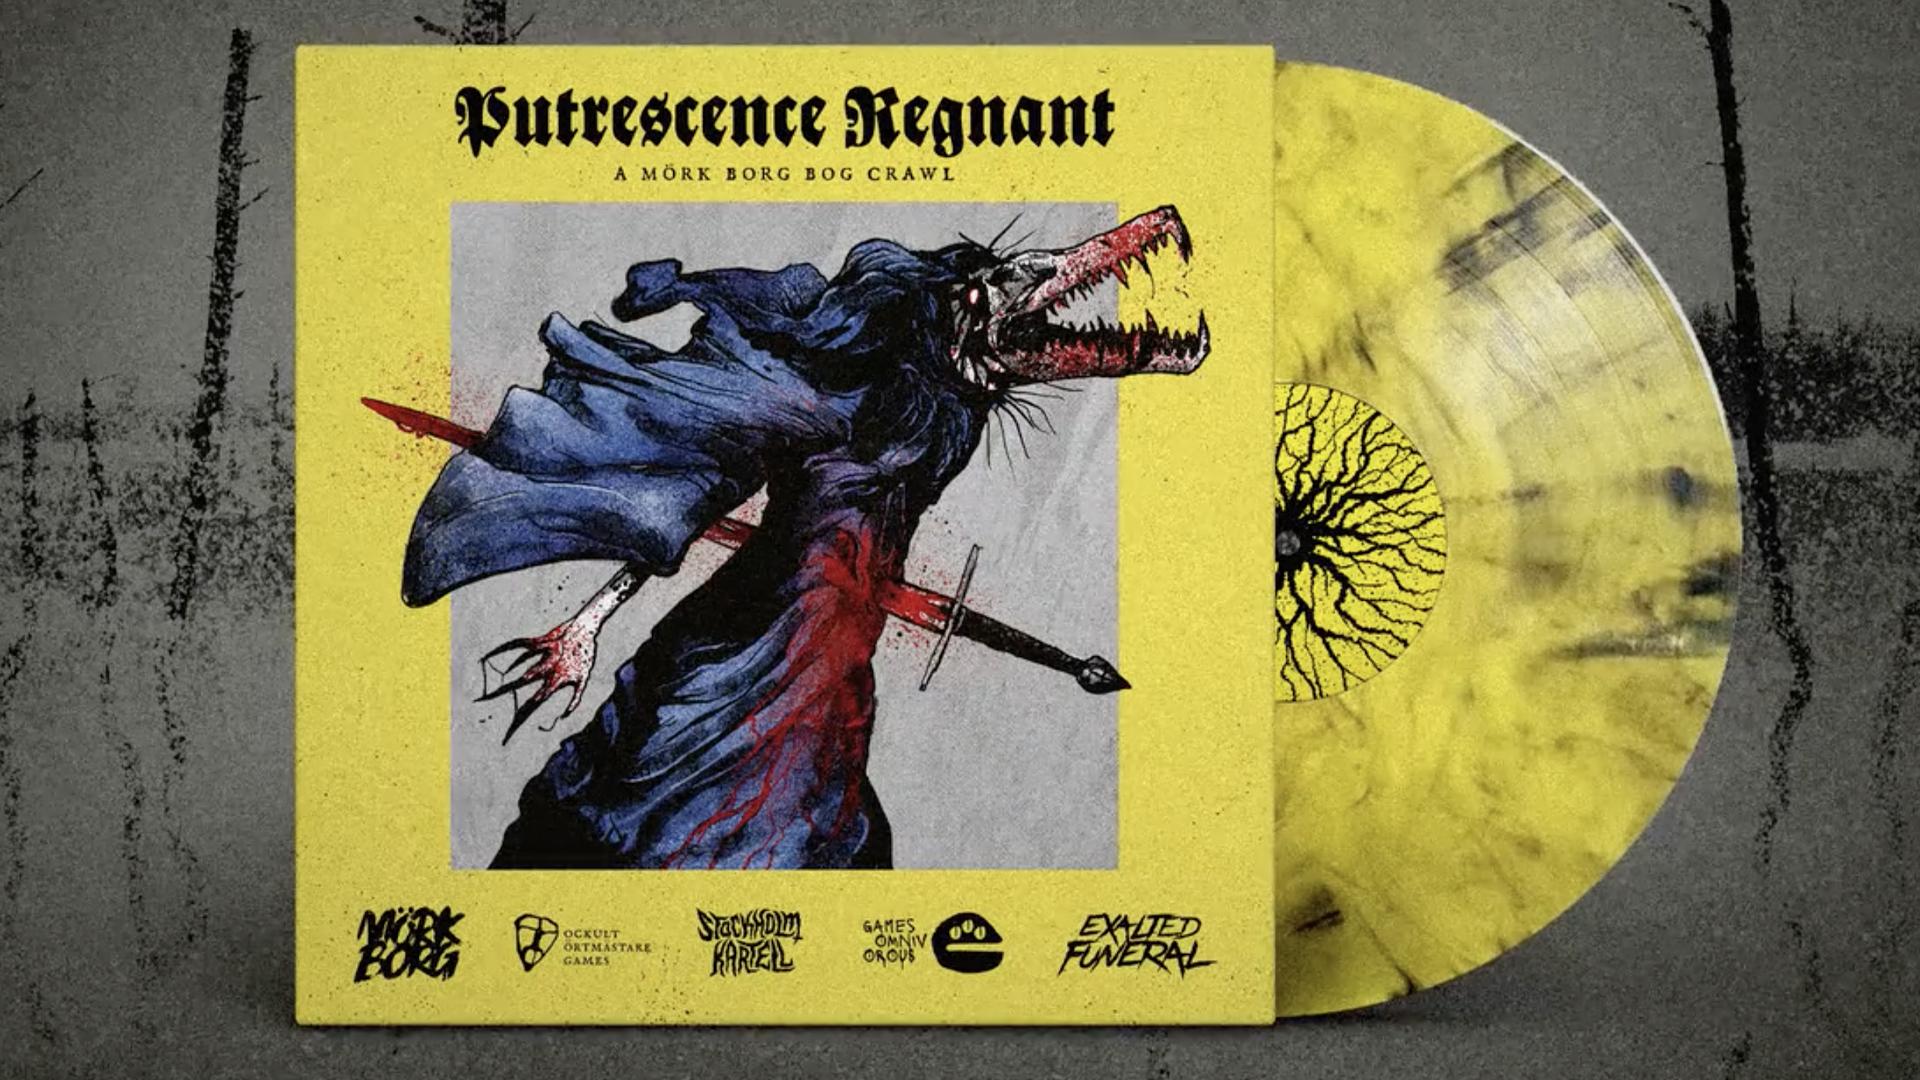 mork-borg-putrescence-regnant-vinyl.png